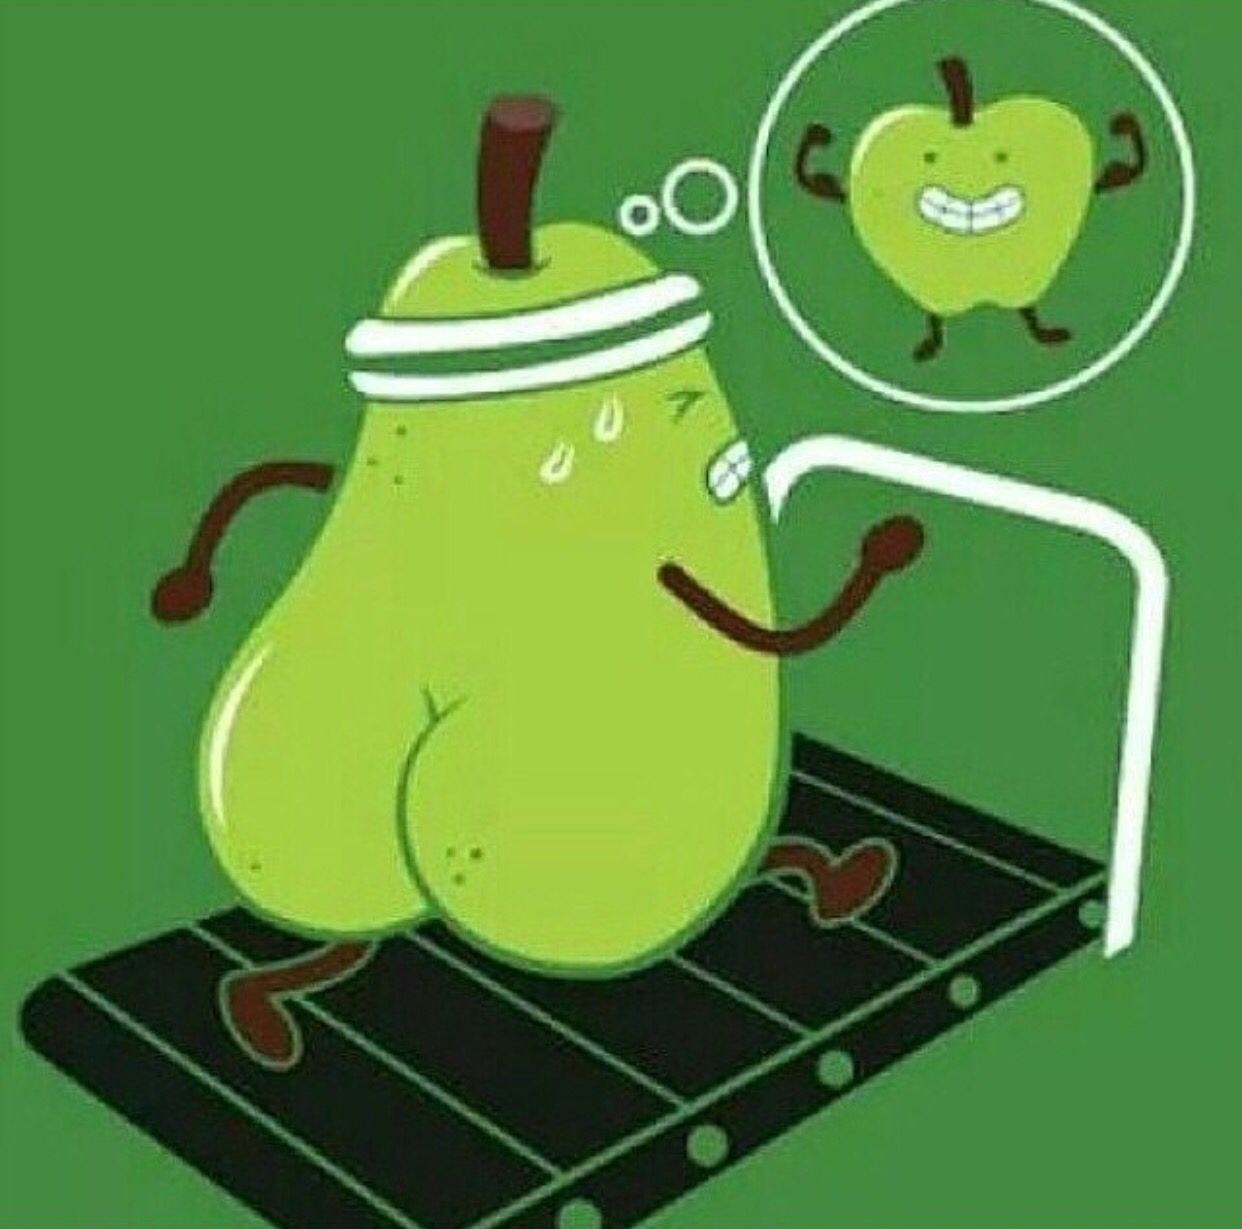 Getting rid of that pear shape